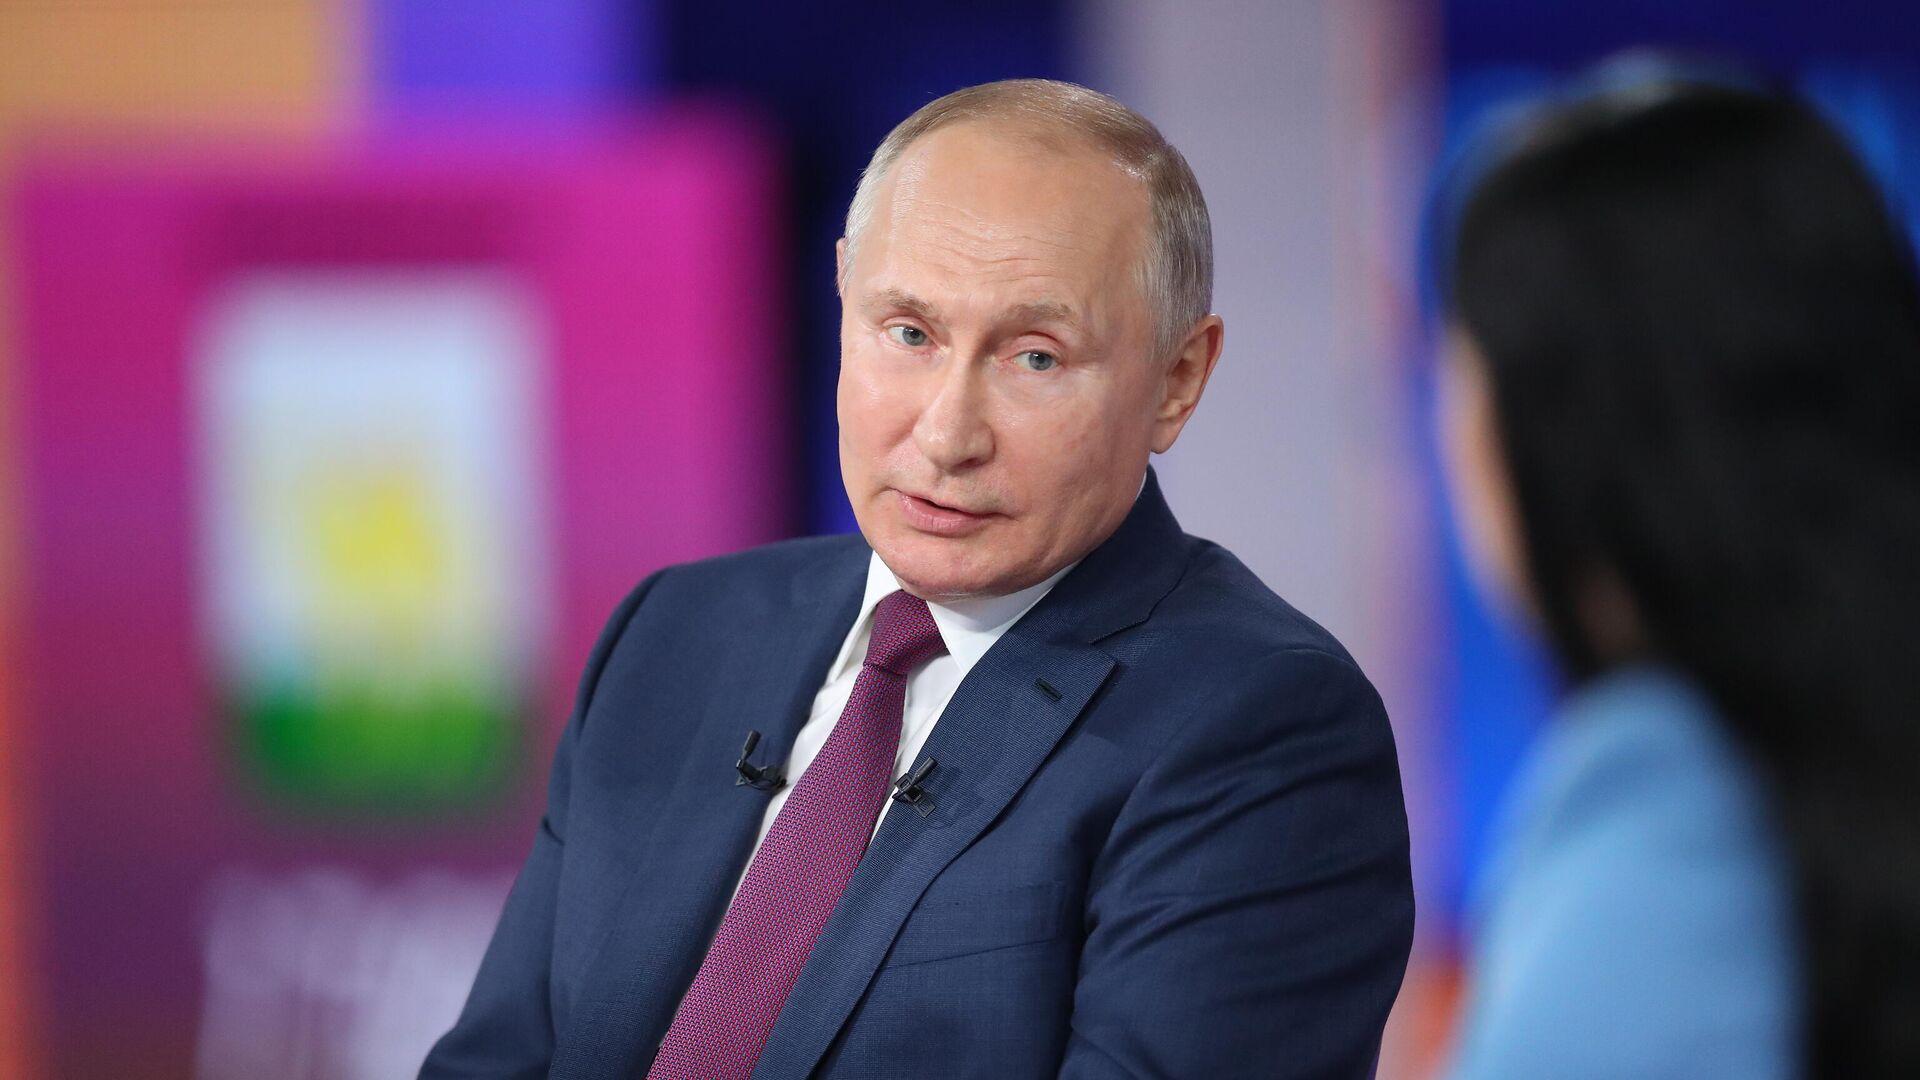 Vladímir Putin, presidente de Rusia - Sputnik Mundo, 1920, 01.09.2021